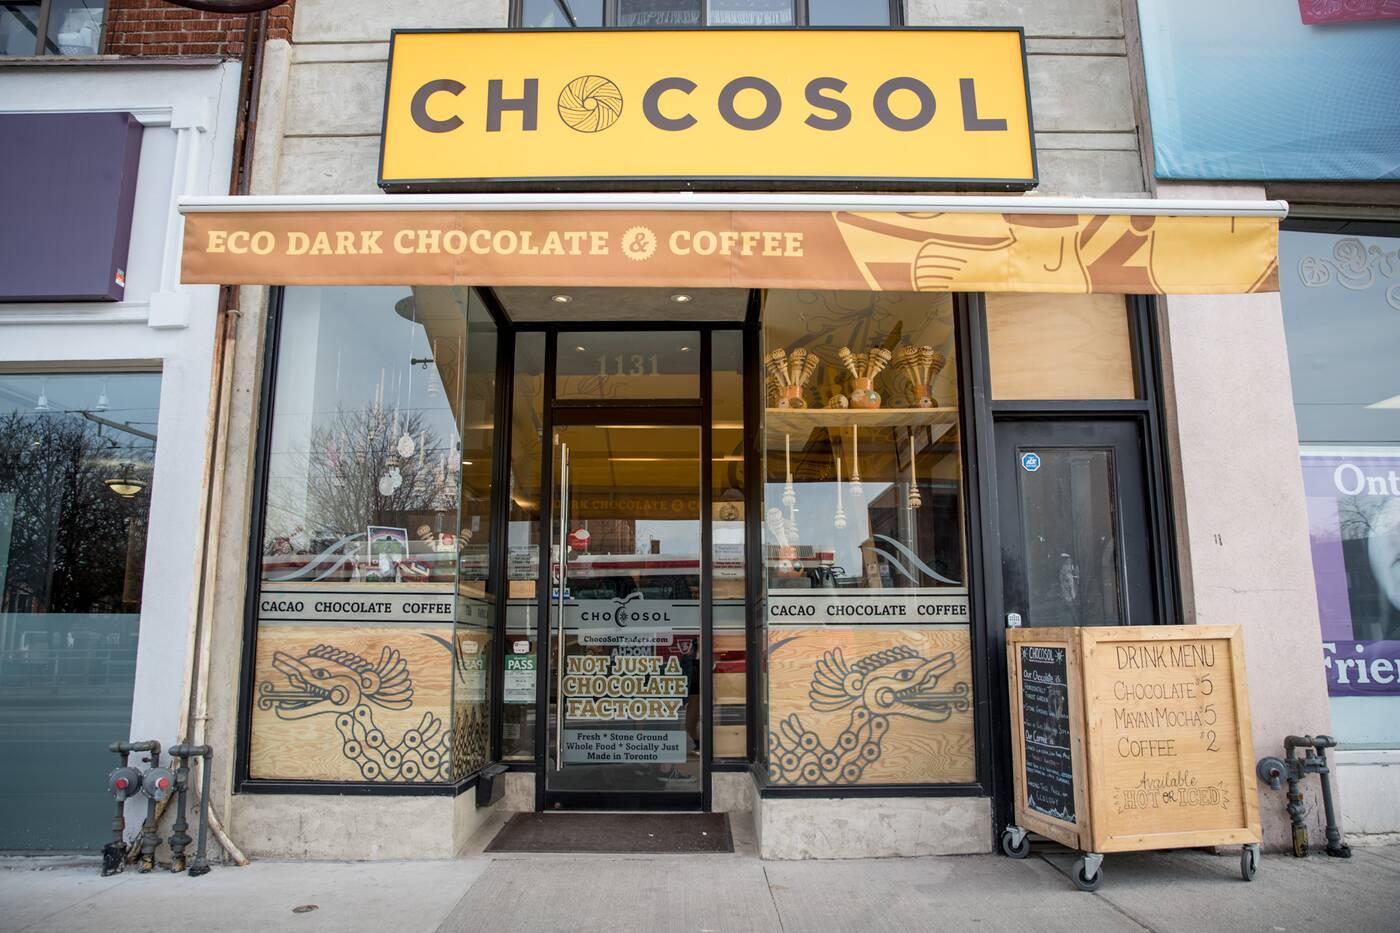 Chocosol Toronto